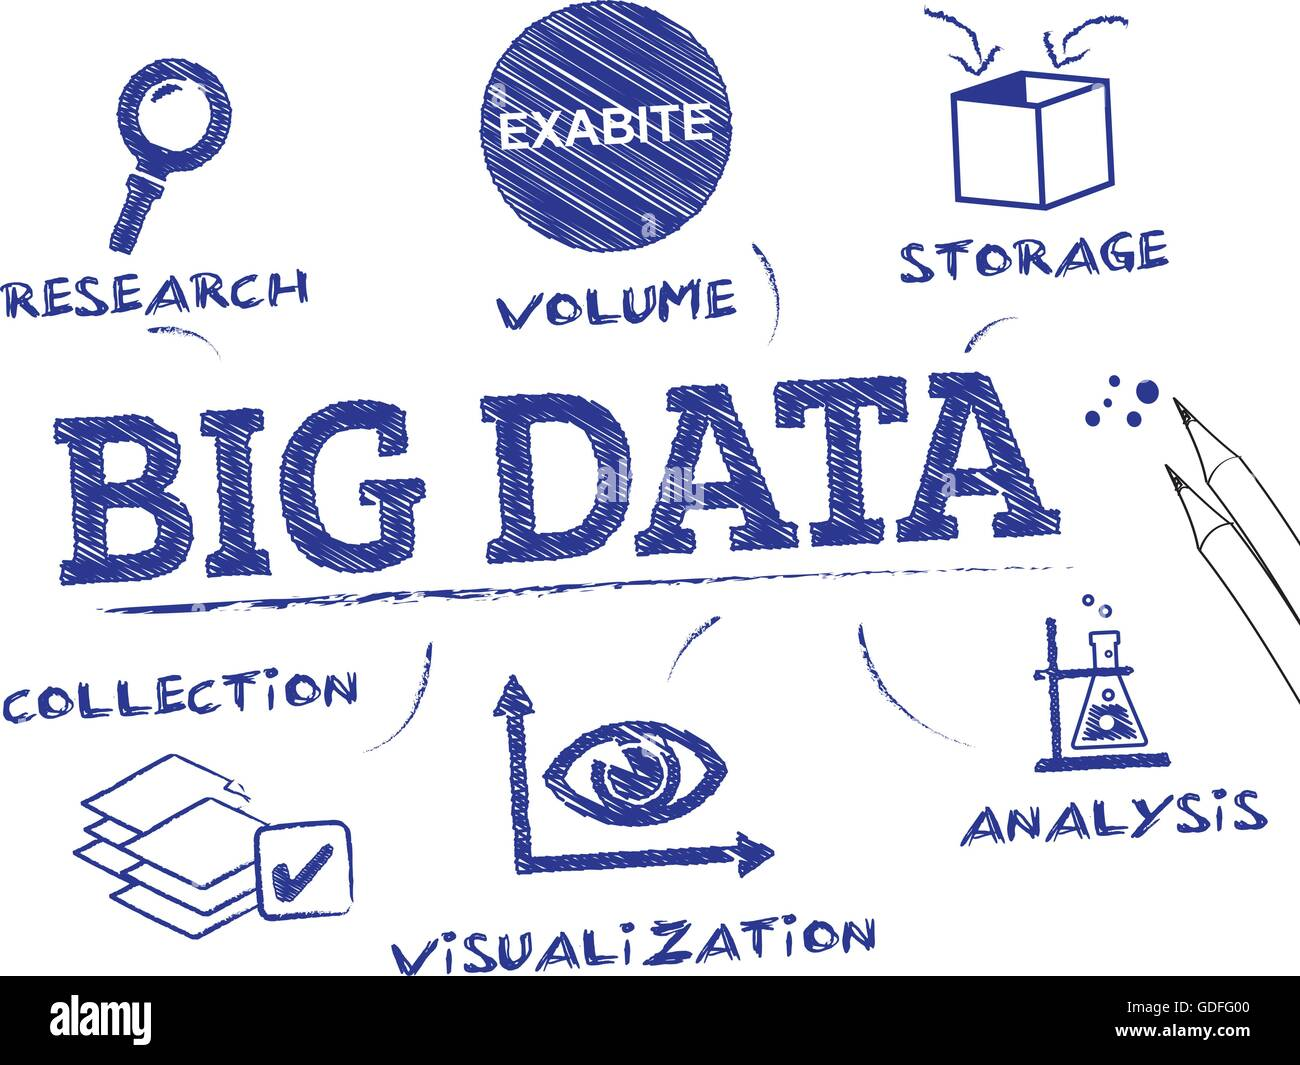 Big Data. Chart with keywords and icons - Stock Image